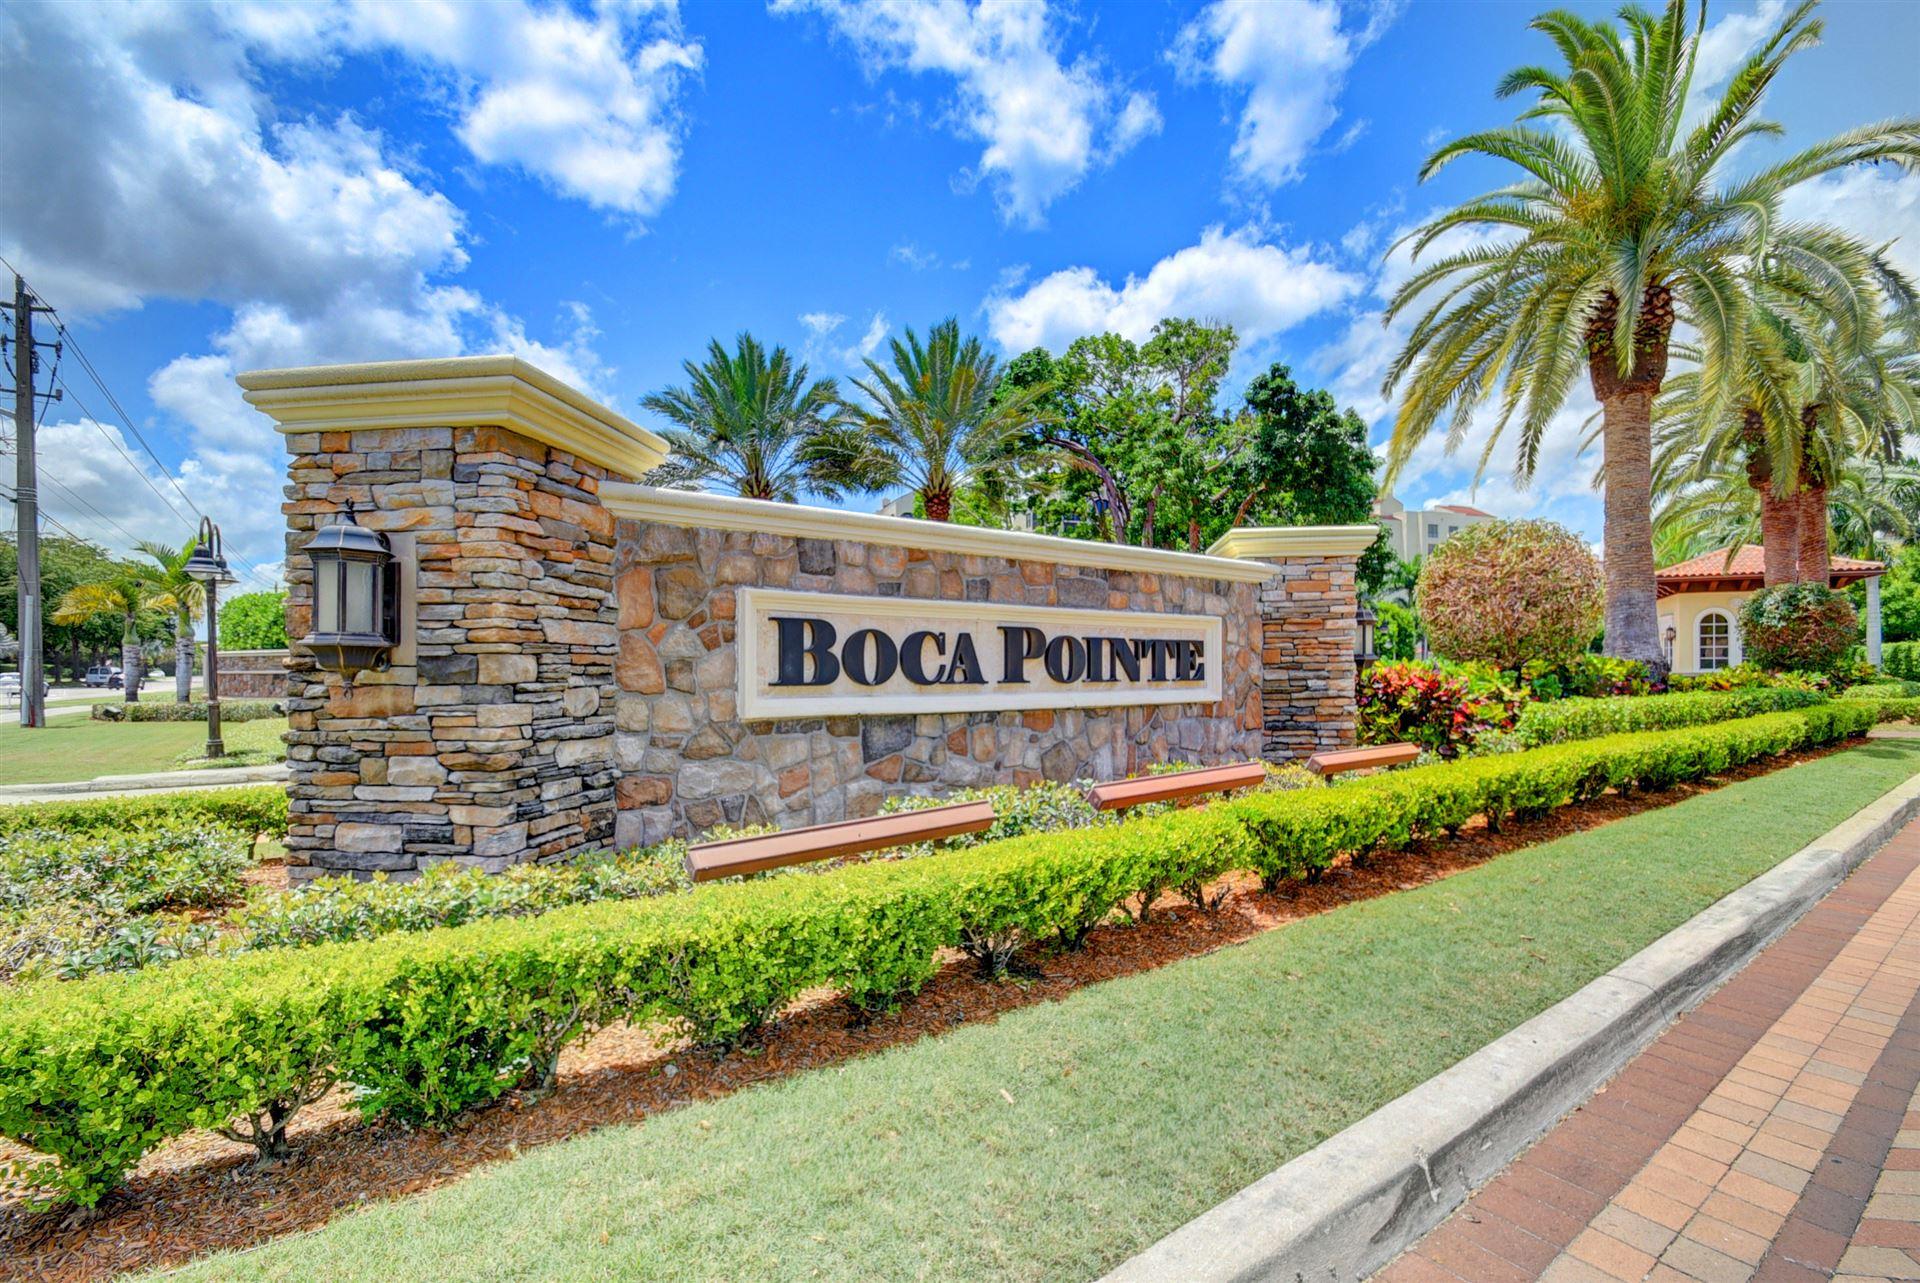 7201 Promenade Drive #802, Boca Raton, FL 33433 - MLS#: RX-10711355